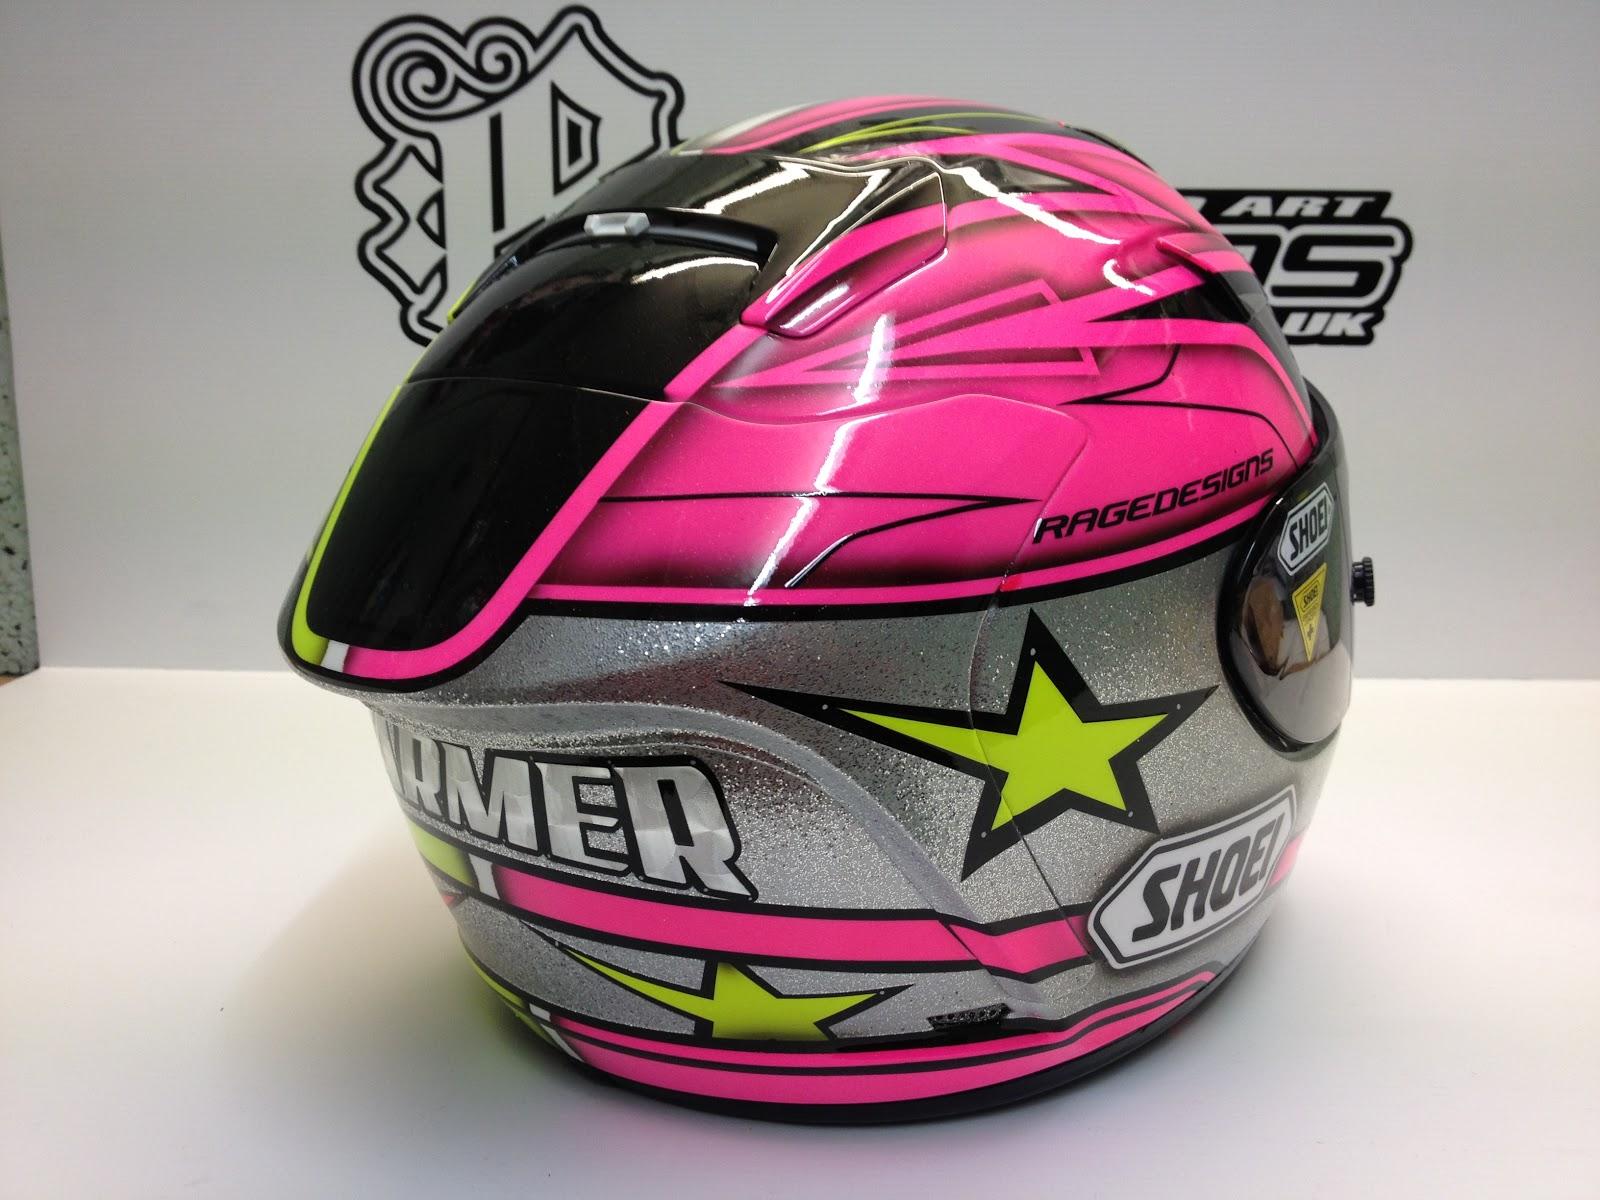 racing helmets garage shoei x spirit ii k farmer 2013 by rage designs. Black Bedroom Furniture Sets. Home Design Ideas